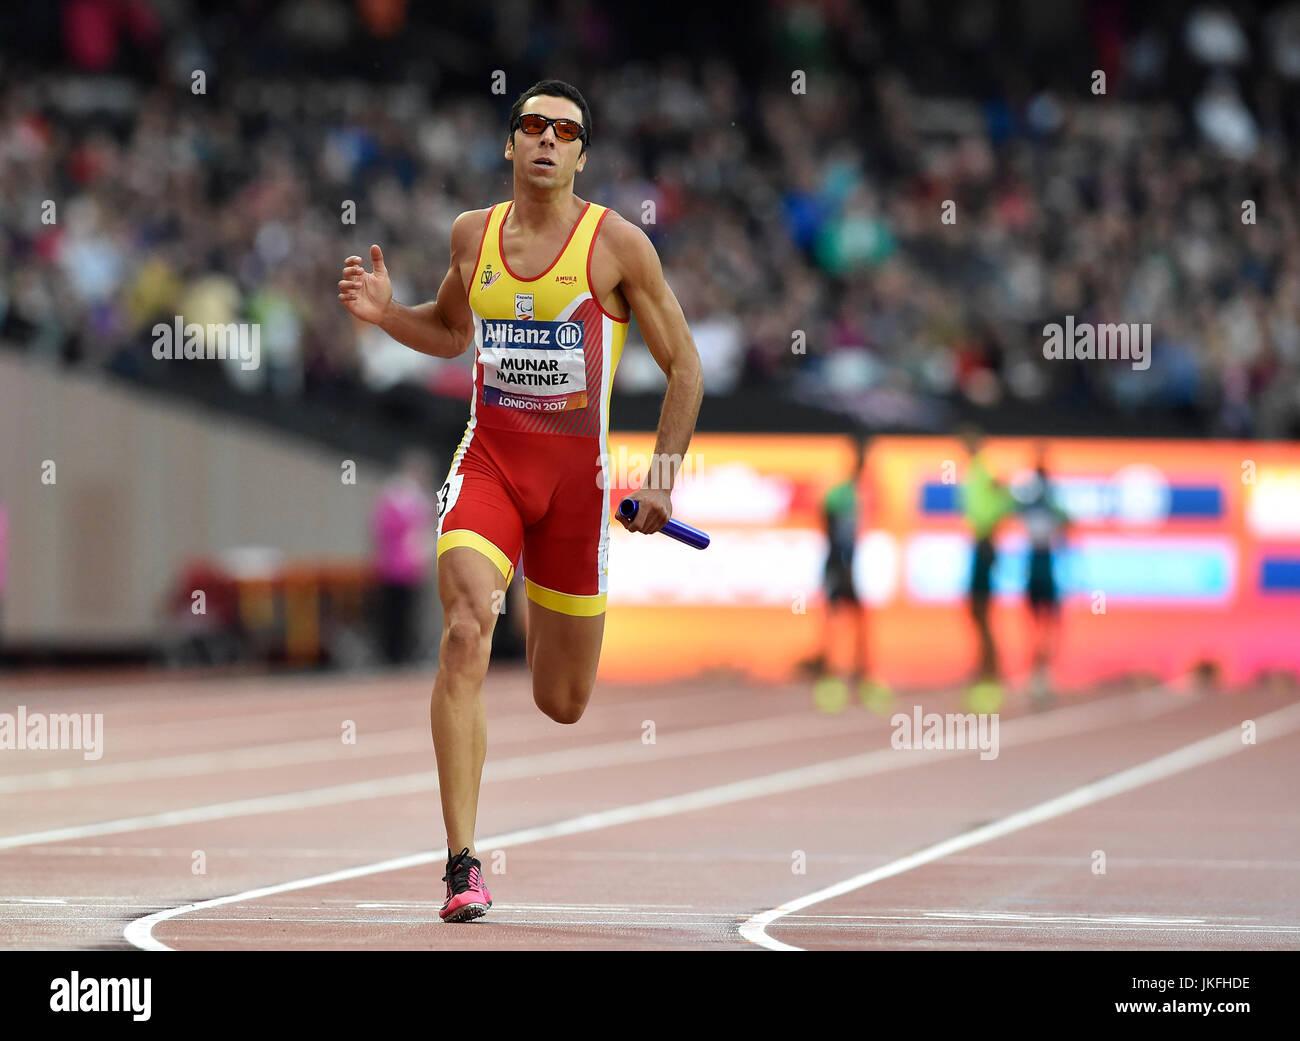 LONDON-ENGLAND - 23. Juli 2017: Joan Munar Martinez (EPS) in Männer 4x100m Staffel T11-13 Finale während Stockbild